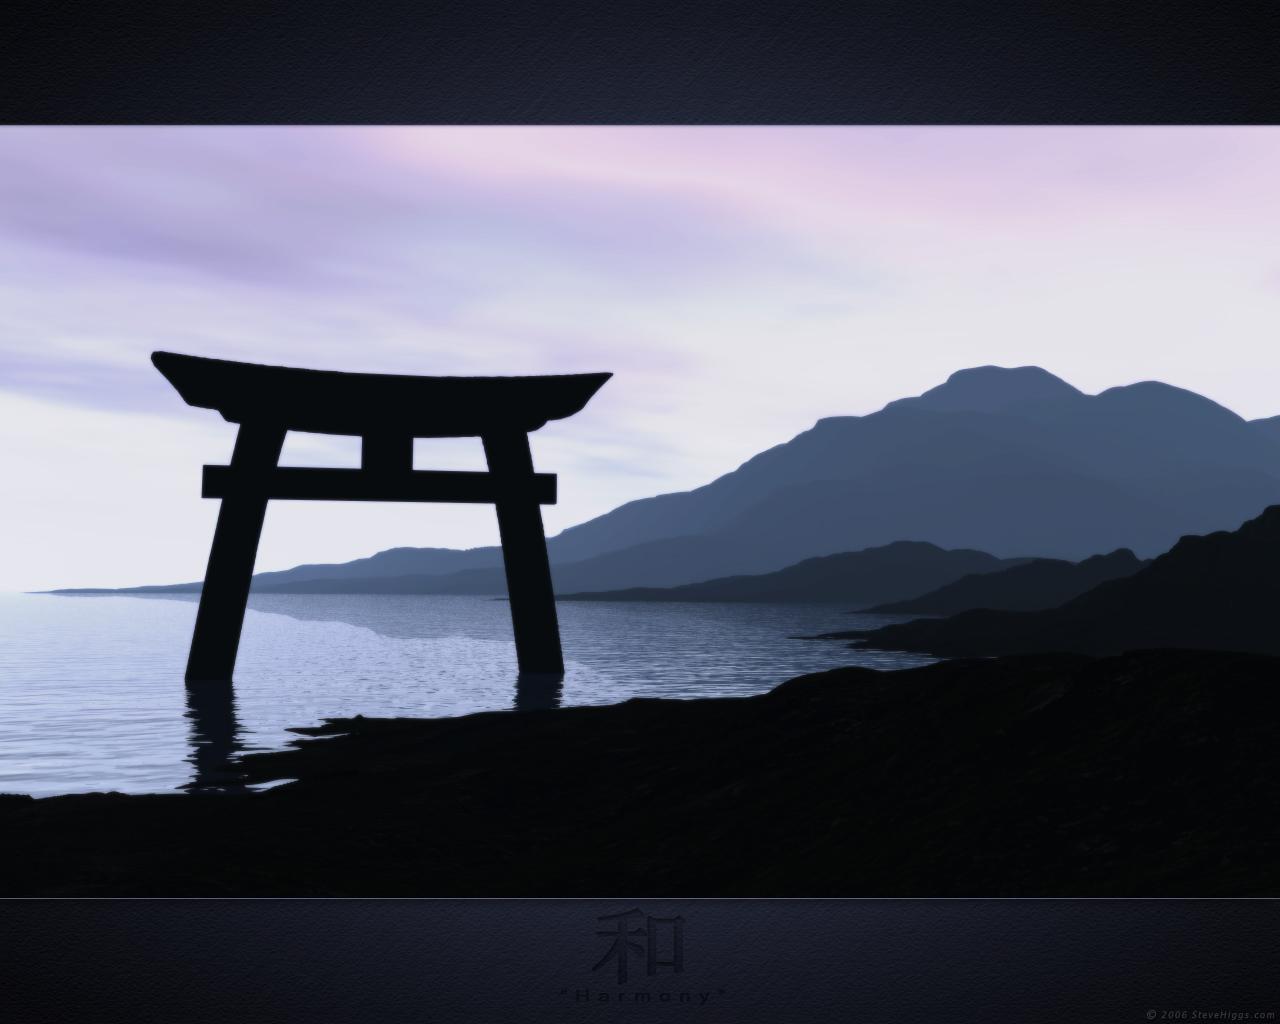 Images of Harmony | 1280x1024